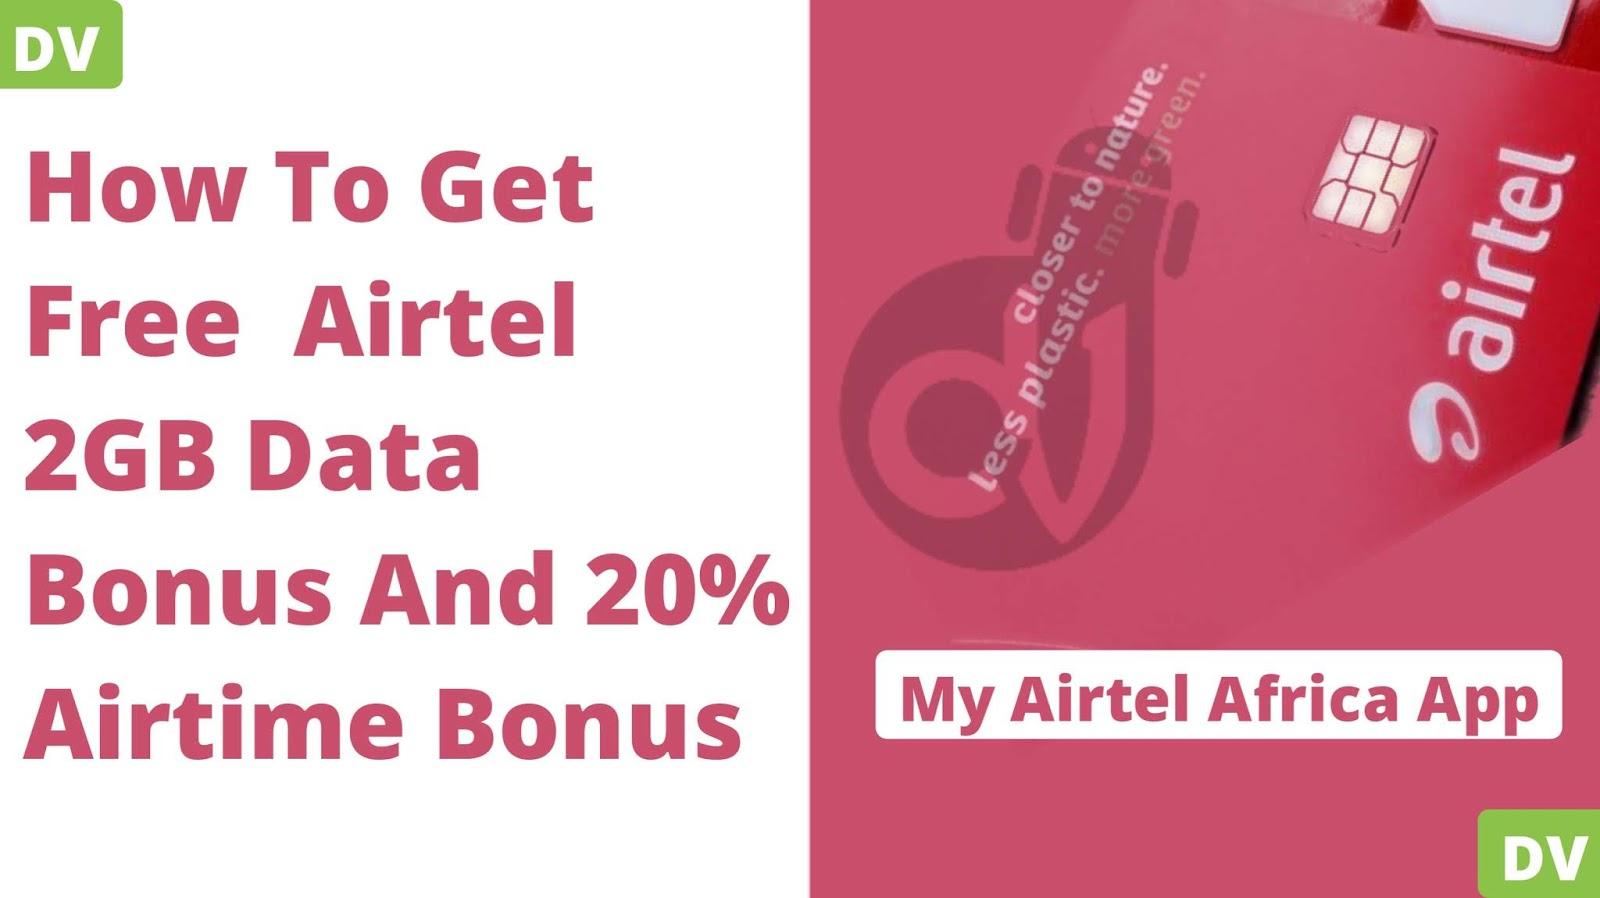 Airtel free 2gb data